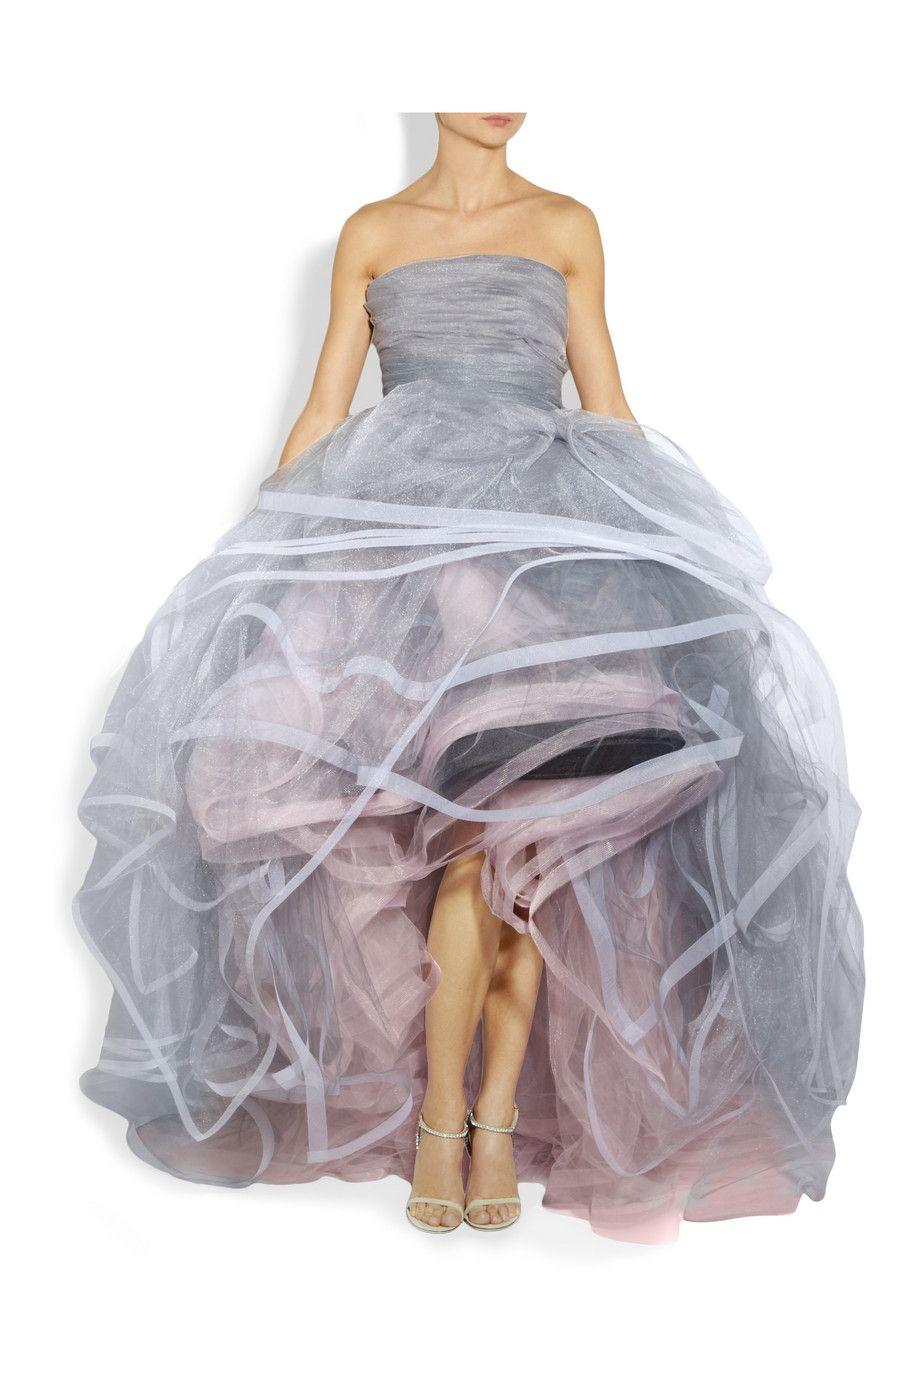 Light up wedding dress  Oscar de la Renta  Layered tulle gown  NETAPORTERCOMLightgray